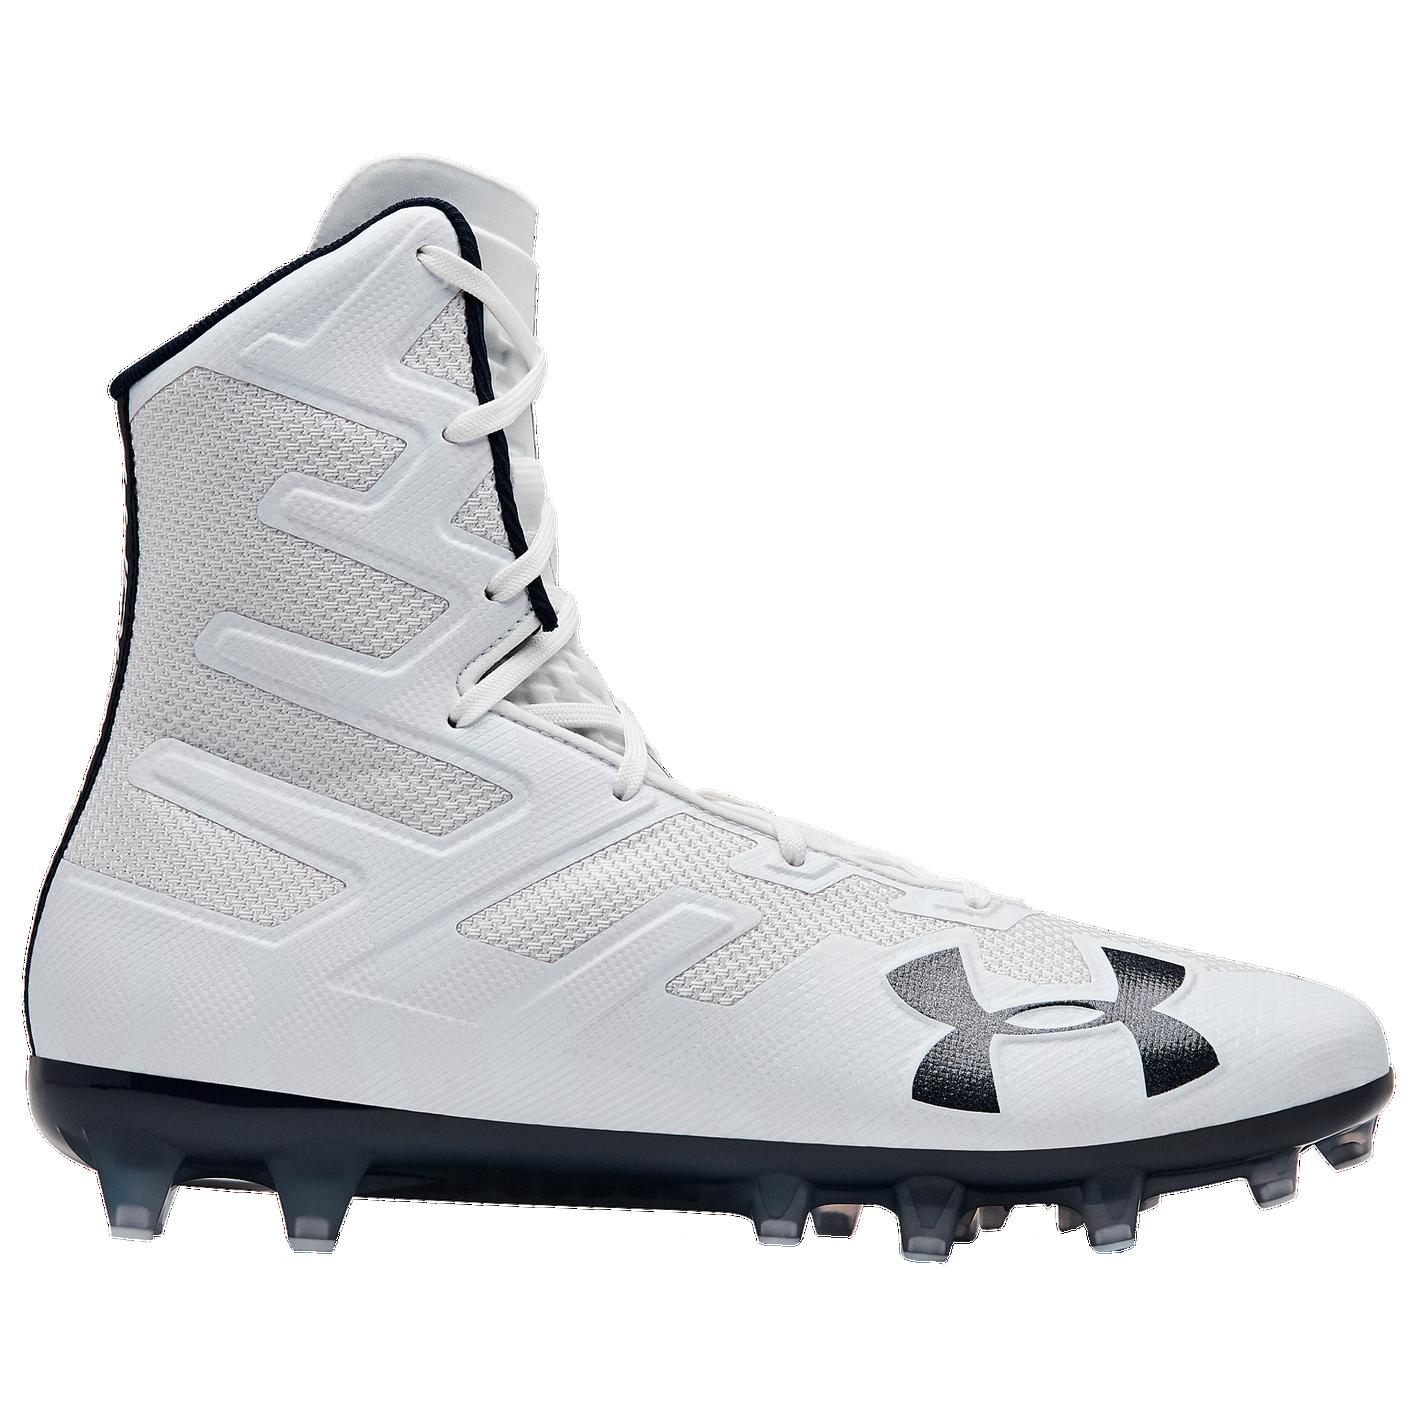 e6abe7fa84b0 Under Armour Lacrosse Highlight MC - Men's - Lacrosse - Shoes ...